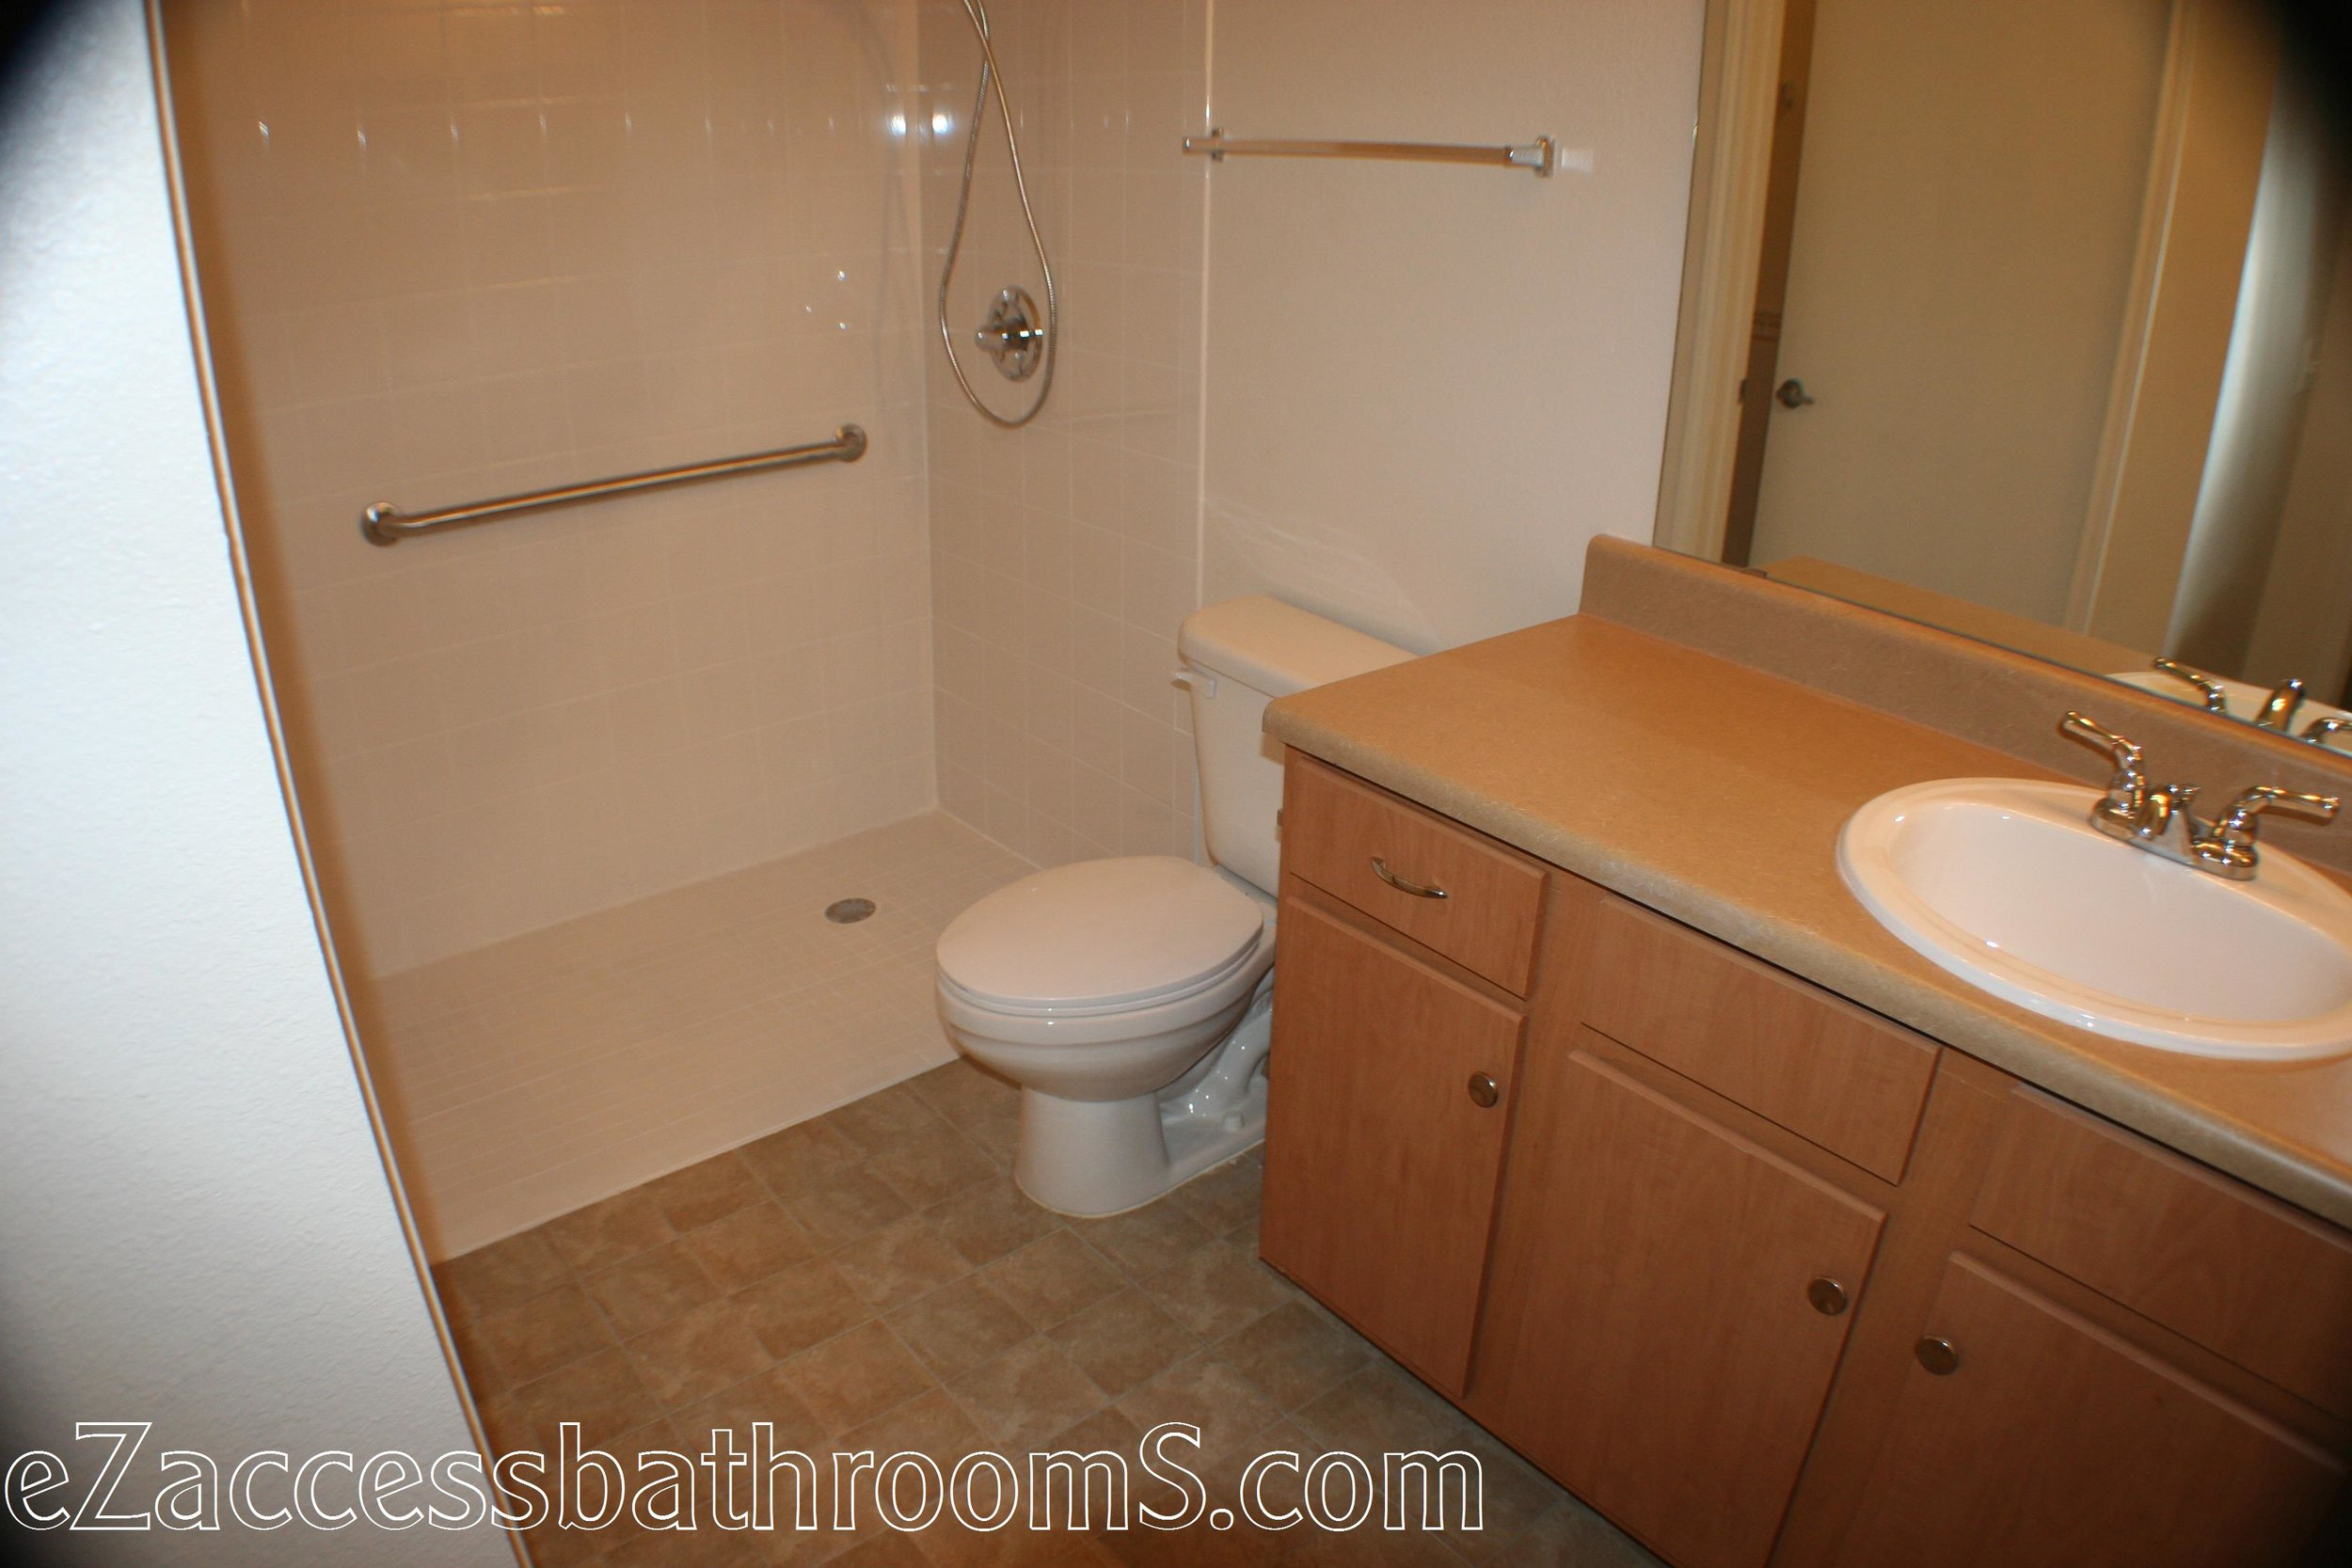 cheap tub to shower conversion ezaccessbathrooms.com 022.JPG